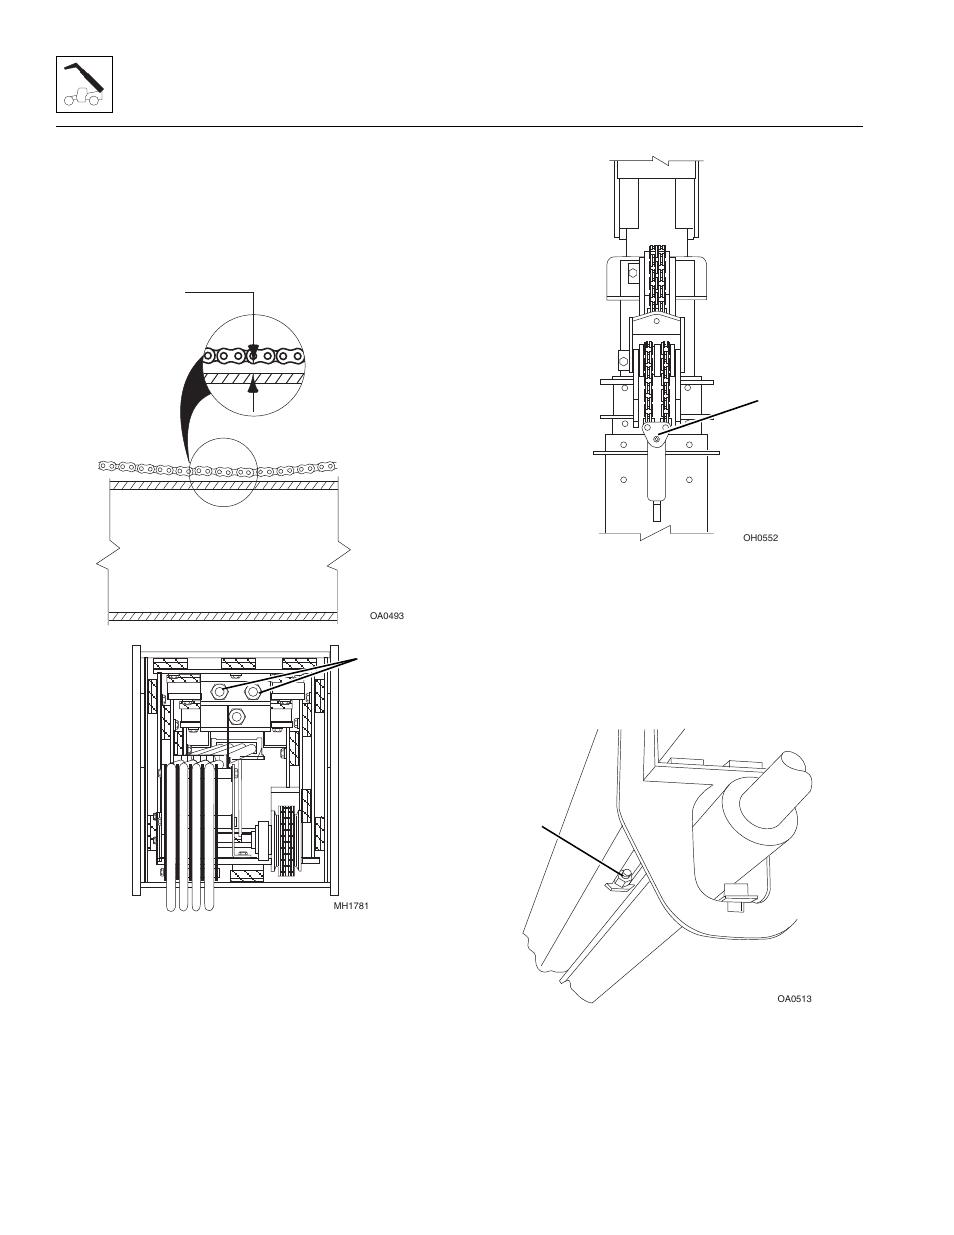 medium resolution of boom chain diagram simple wiring schema white gold chain bracelet 7 boom chain tension adjustment